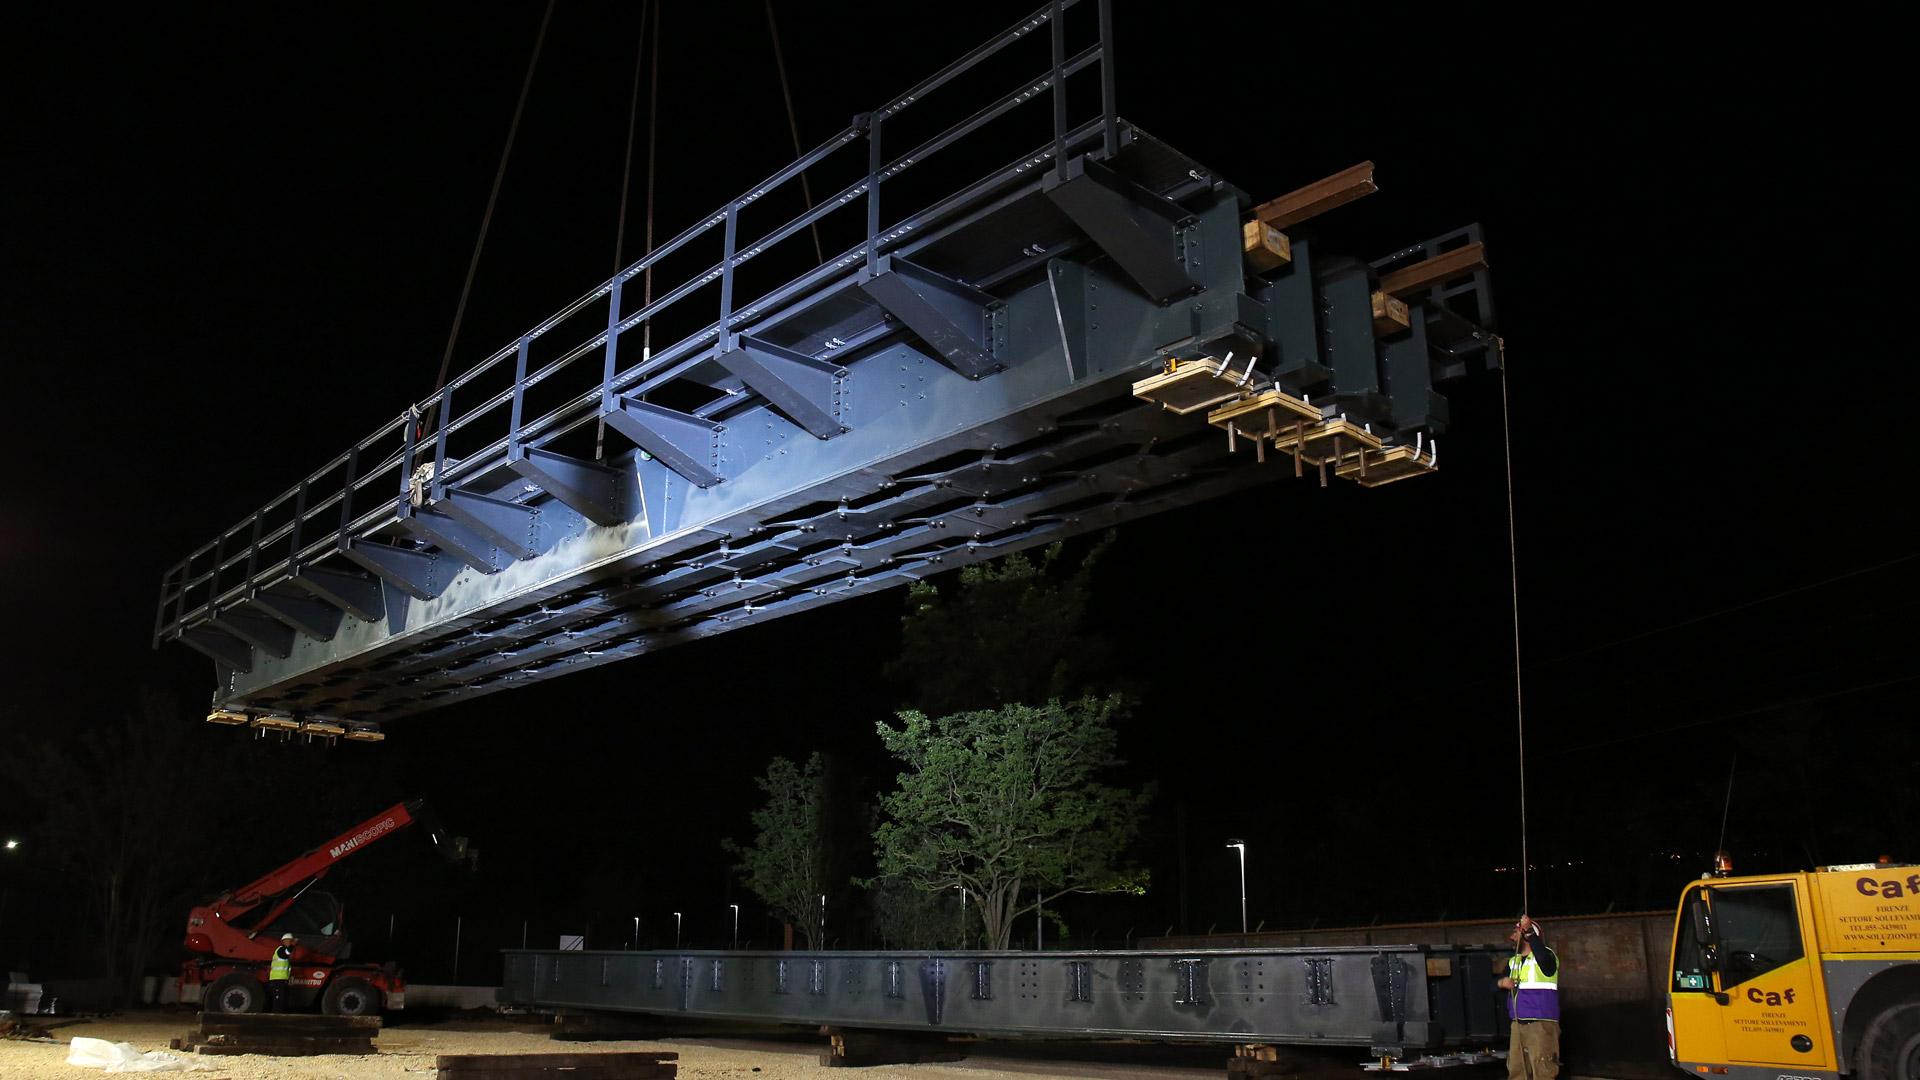 ponte-ferroviario-fiume-cavata-metal-engineering-carpenteria-civile-posa-opera